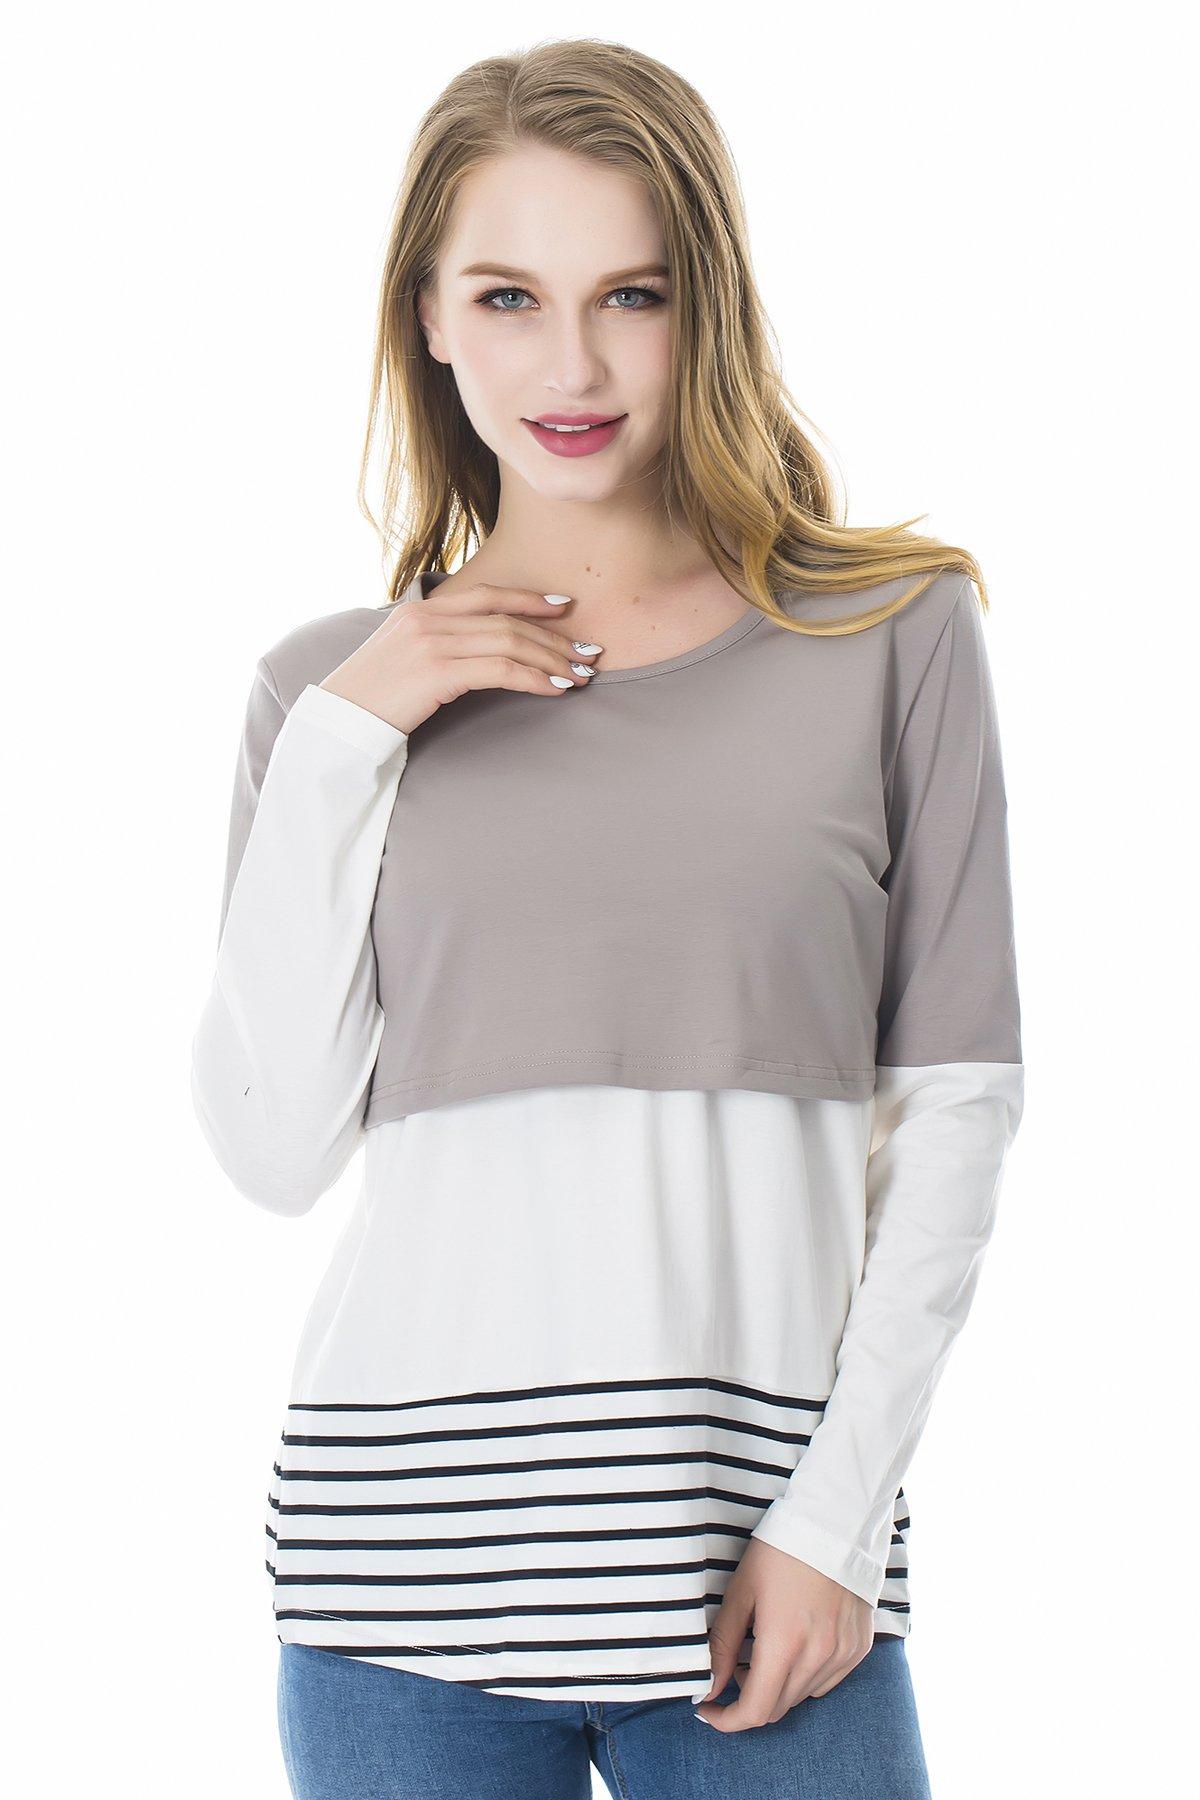 Smallshow Women's Long Sleeve Back Lace Maternity Nursing Tops Medium Light Gray